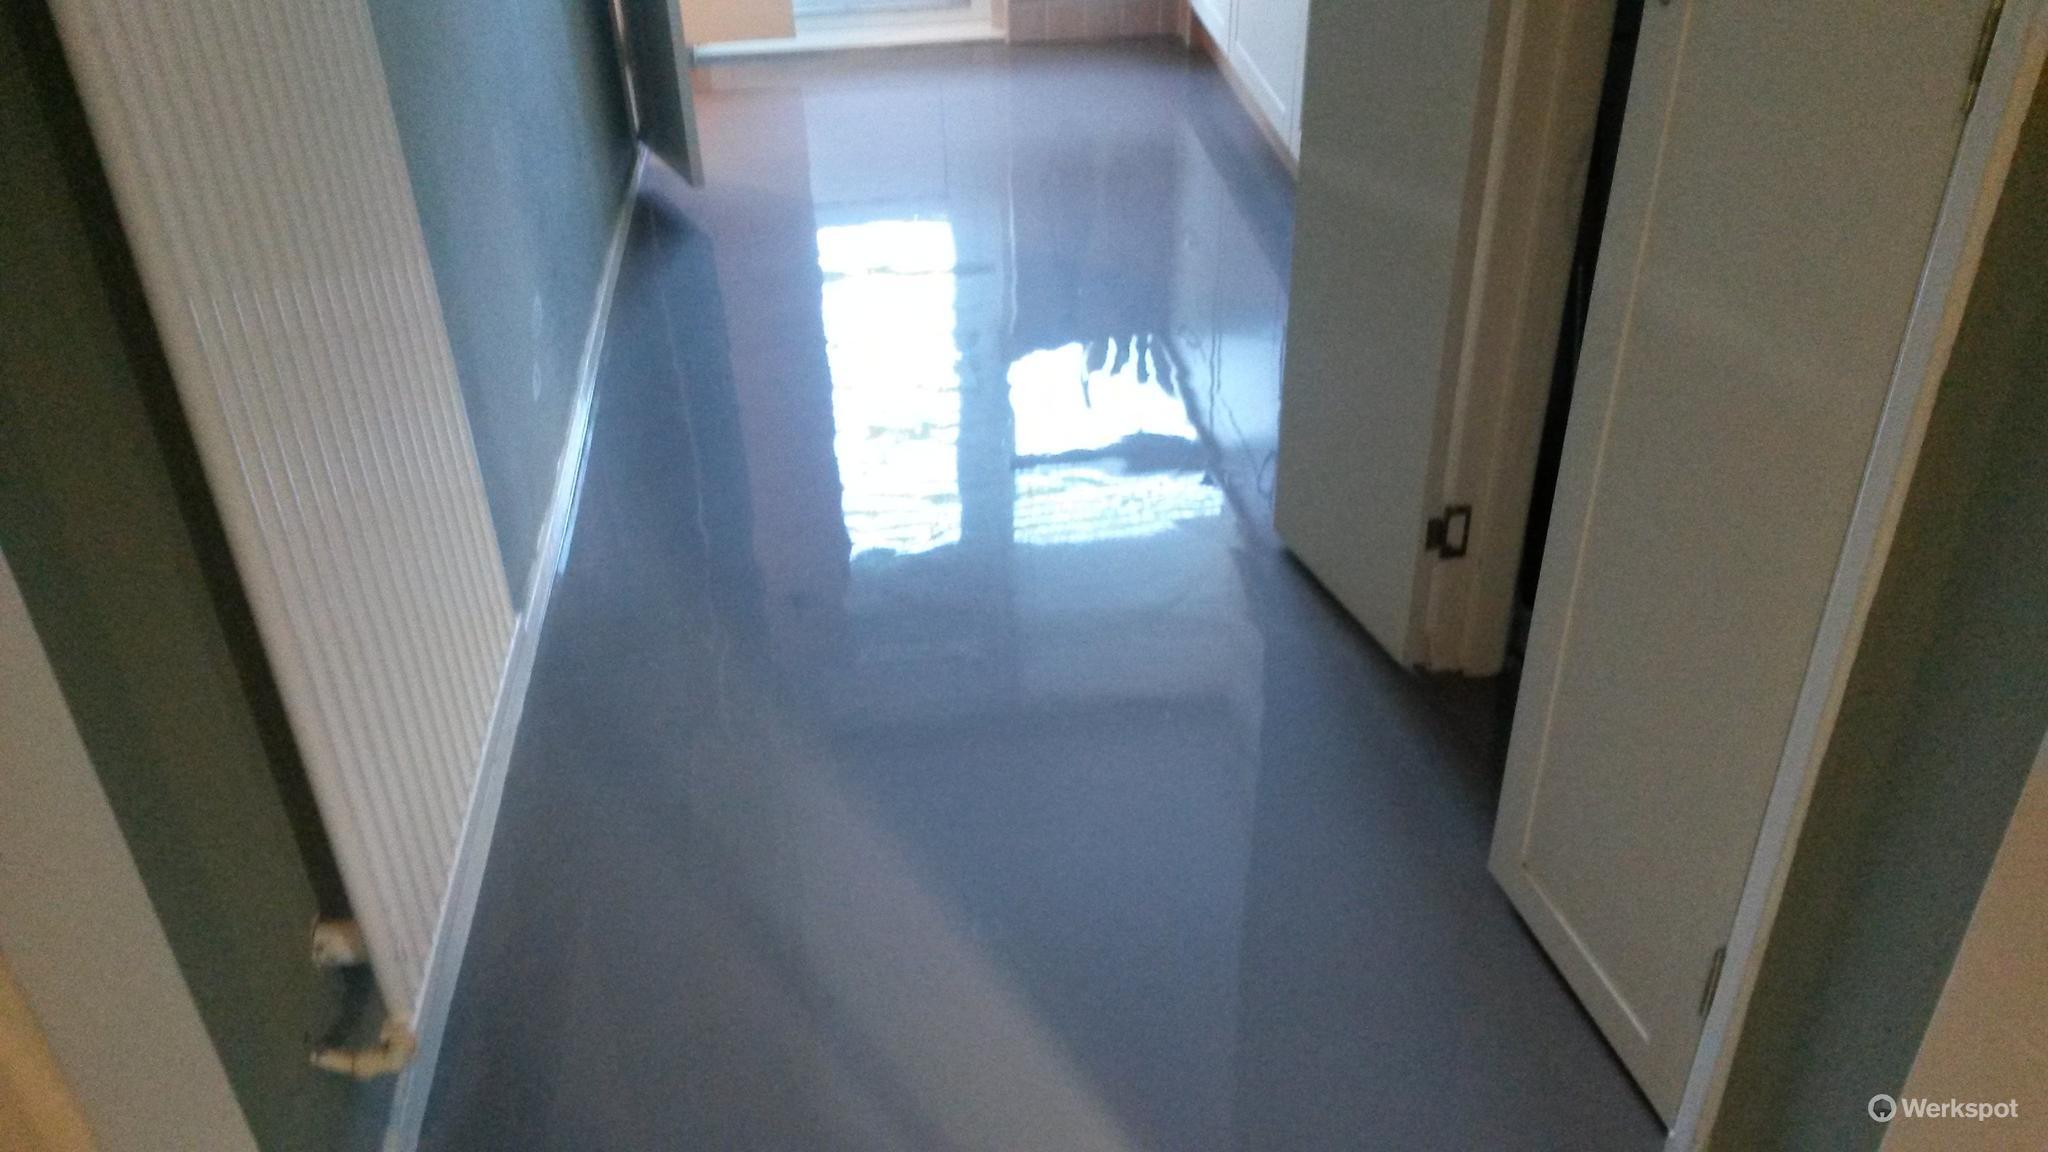 Keuken en badkamer egaliseren laminaat plak leggen werkspot